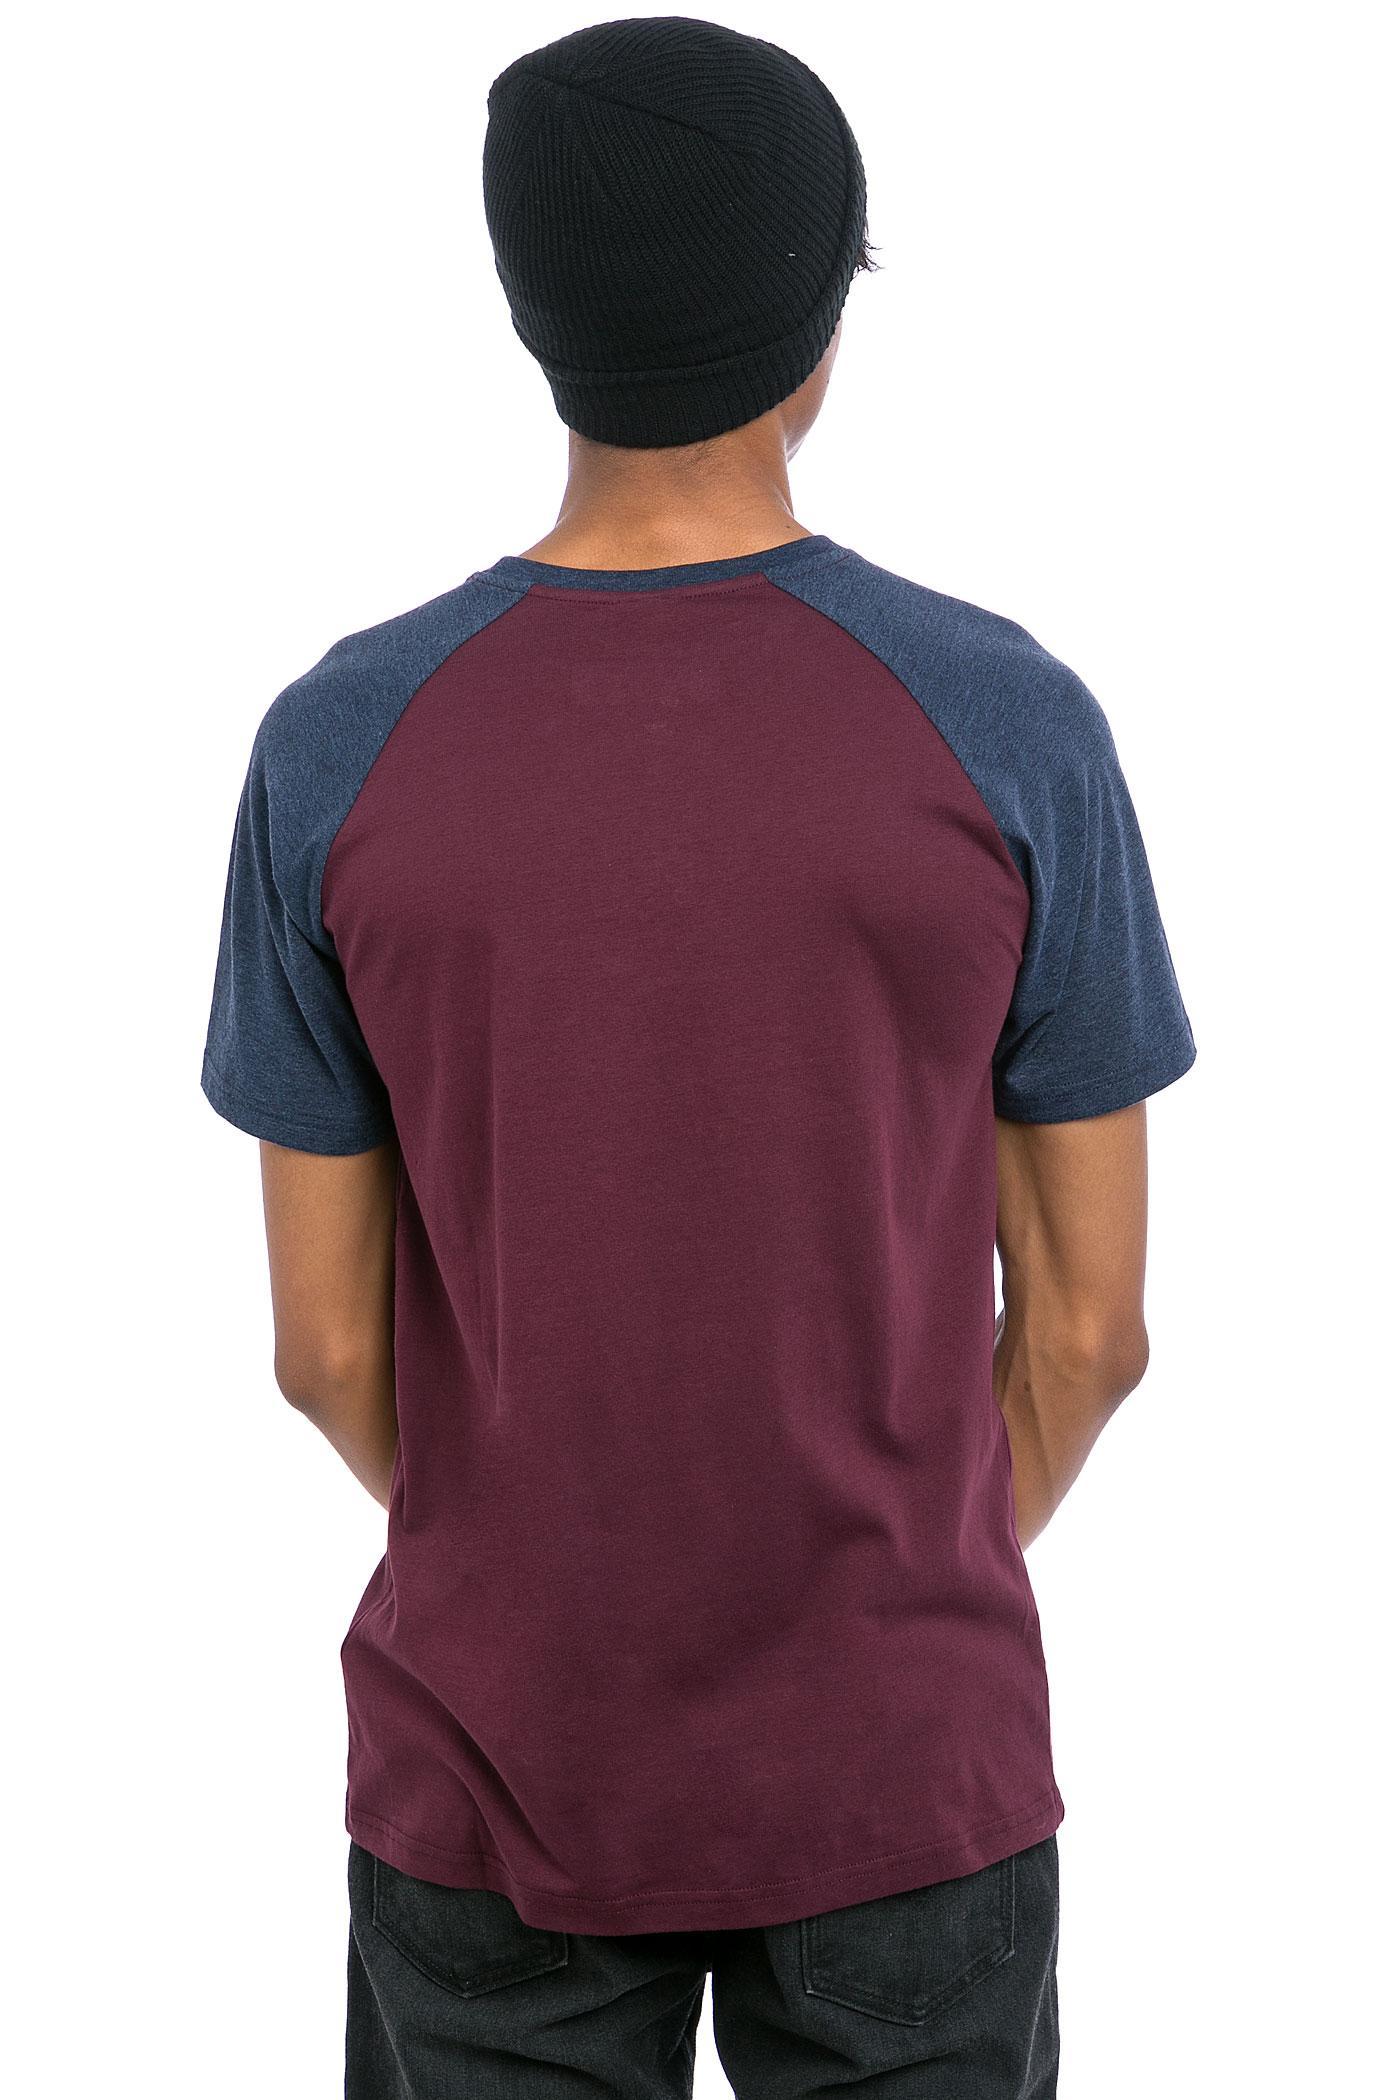 iriedaily rugged t shirt navy red achetez sur skatedeluxe. Black Bedroom Furniture Sets. Home Design Ideas